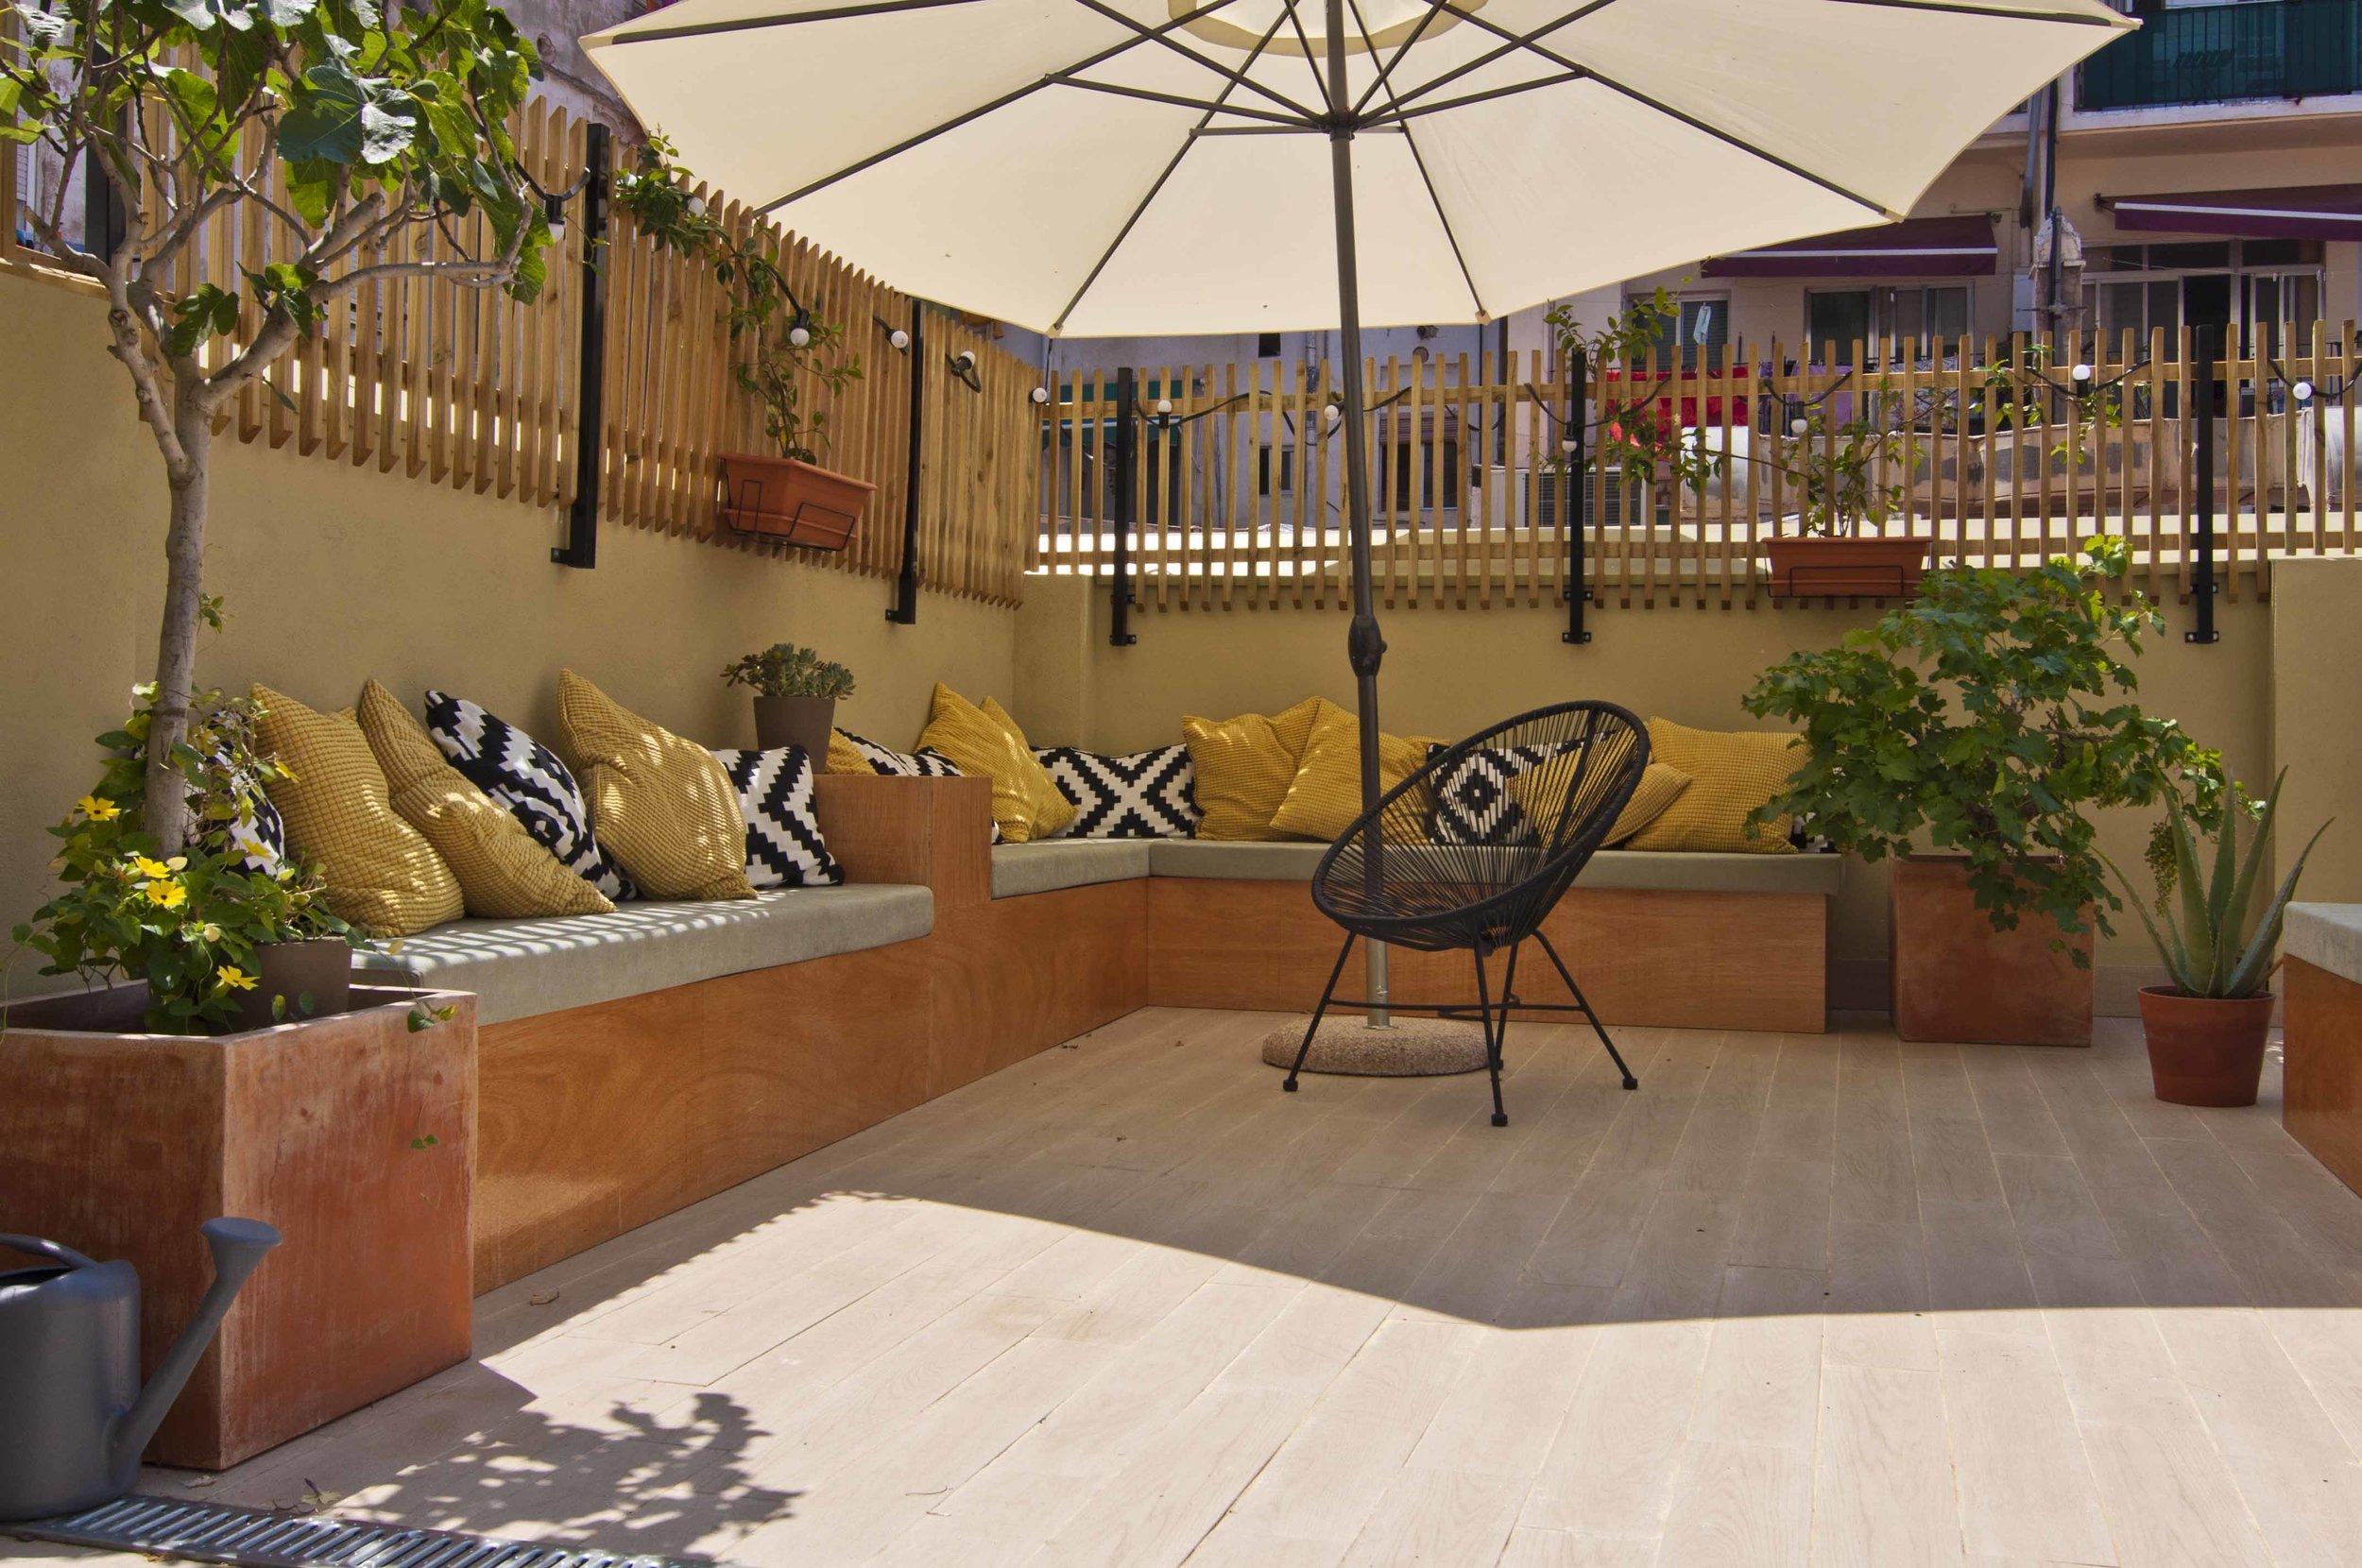 Terrace of Zalamera B&B in Valencia, Spain 0660.jpg